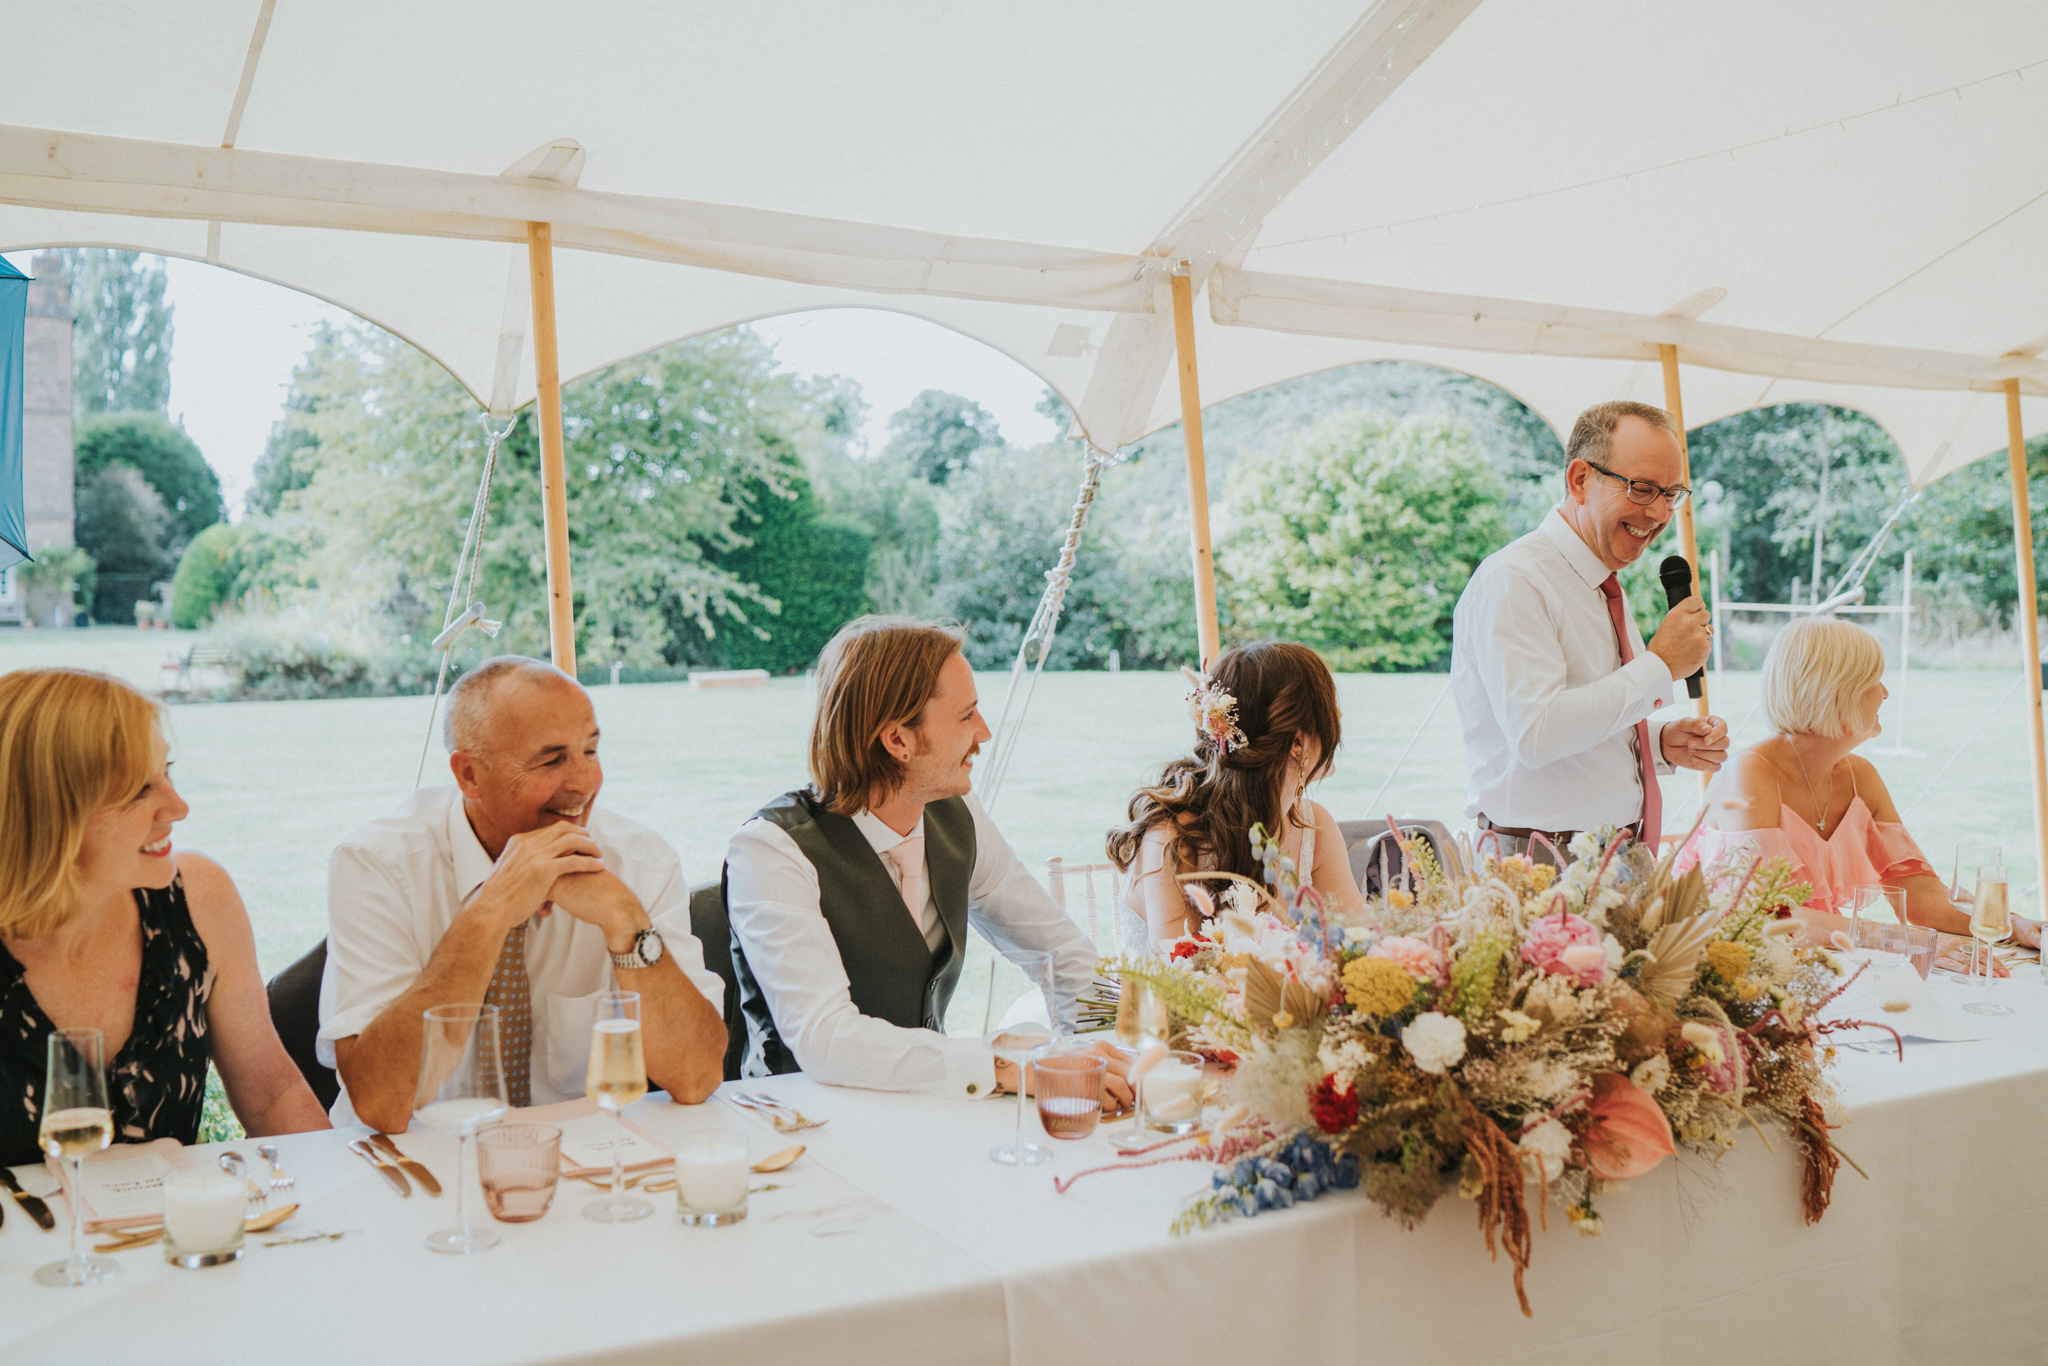 emi-Jack-boho-diy-wedding-eggington-house-grace-elizabeth-colchester-essex-alternative-wedding-photographer-suffolk-norfolk-devon (37 of 56).jpg